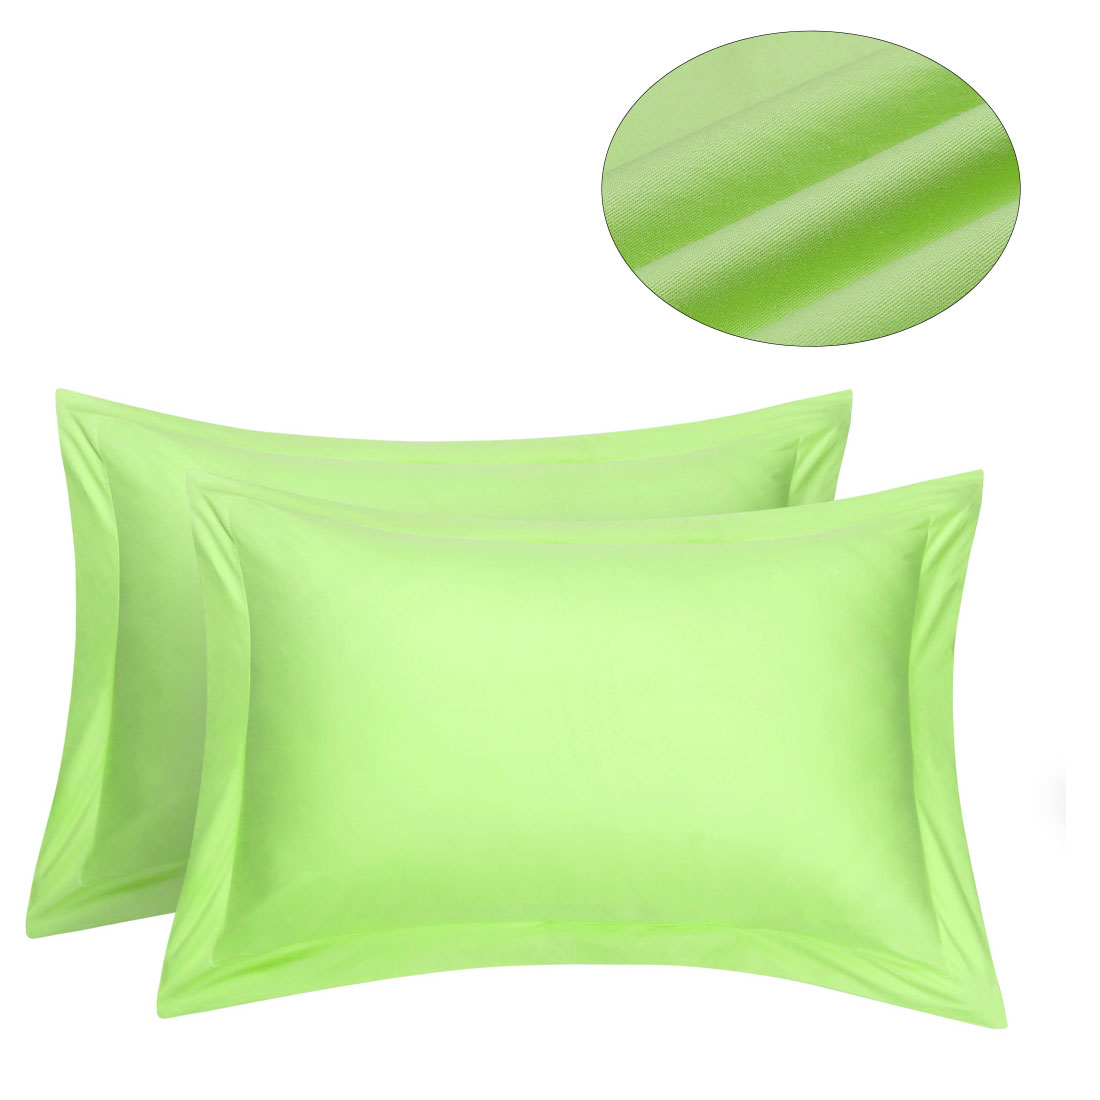 Bedroom Egyptian Cotton Pillow Shams Case Cover Pillowcase Protector Green 20 X 30 Inch Set Of 2 Bedding For Home Walmart Com Walmart Com